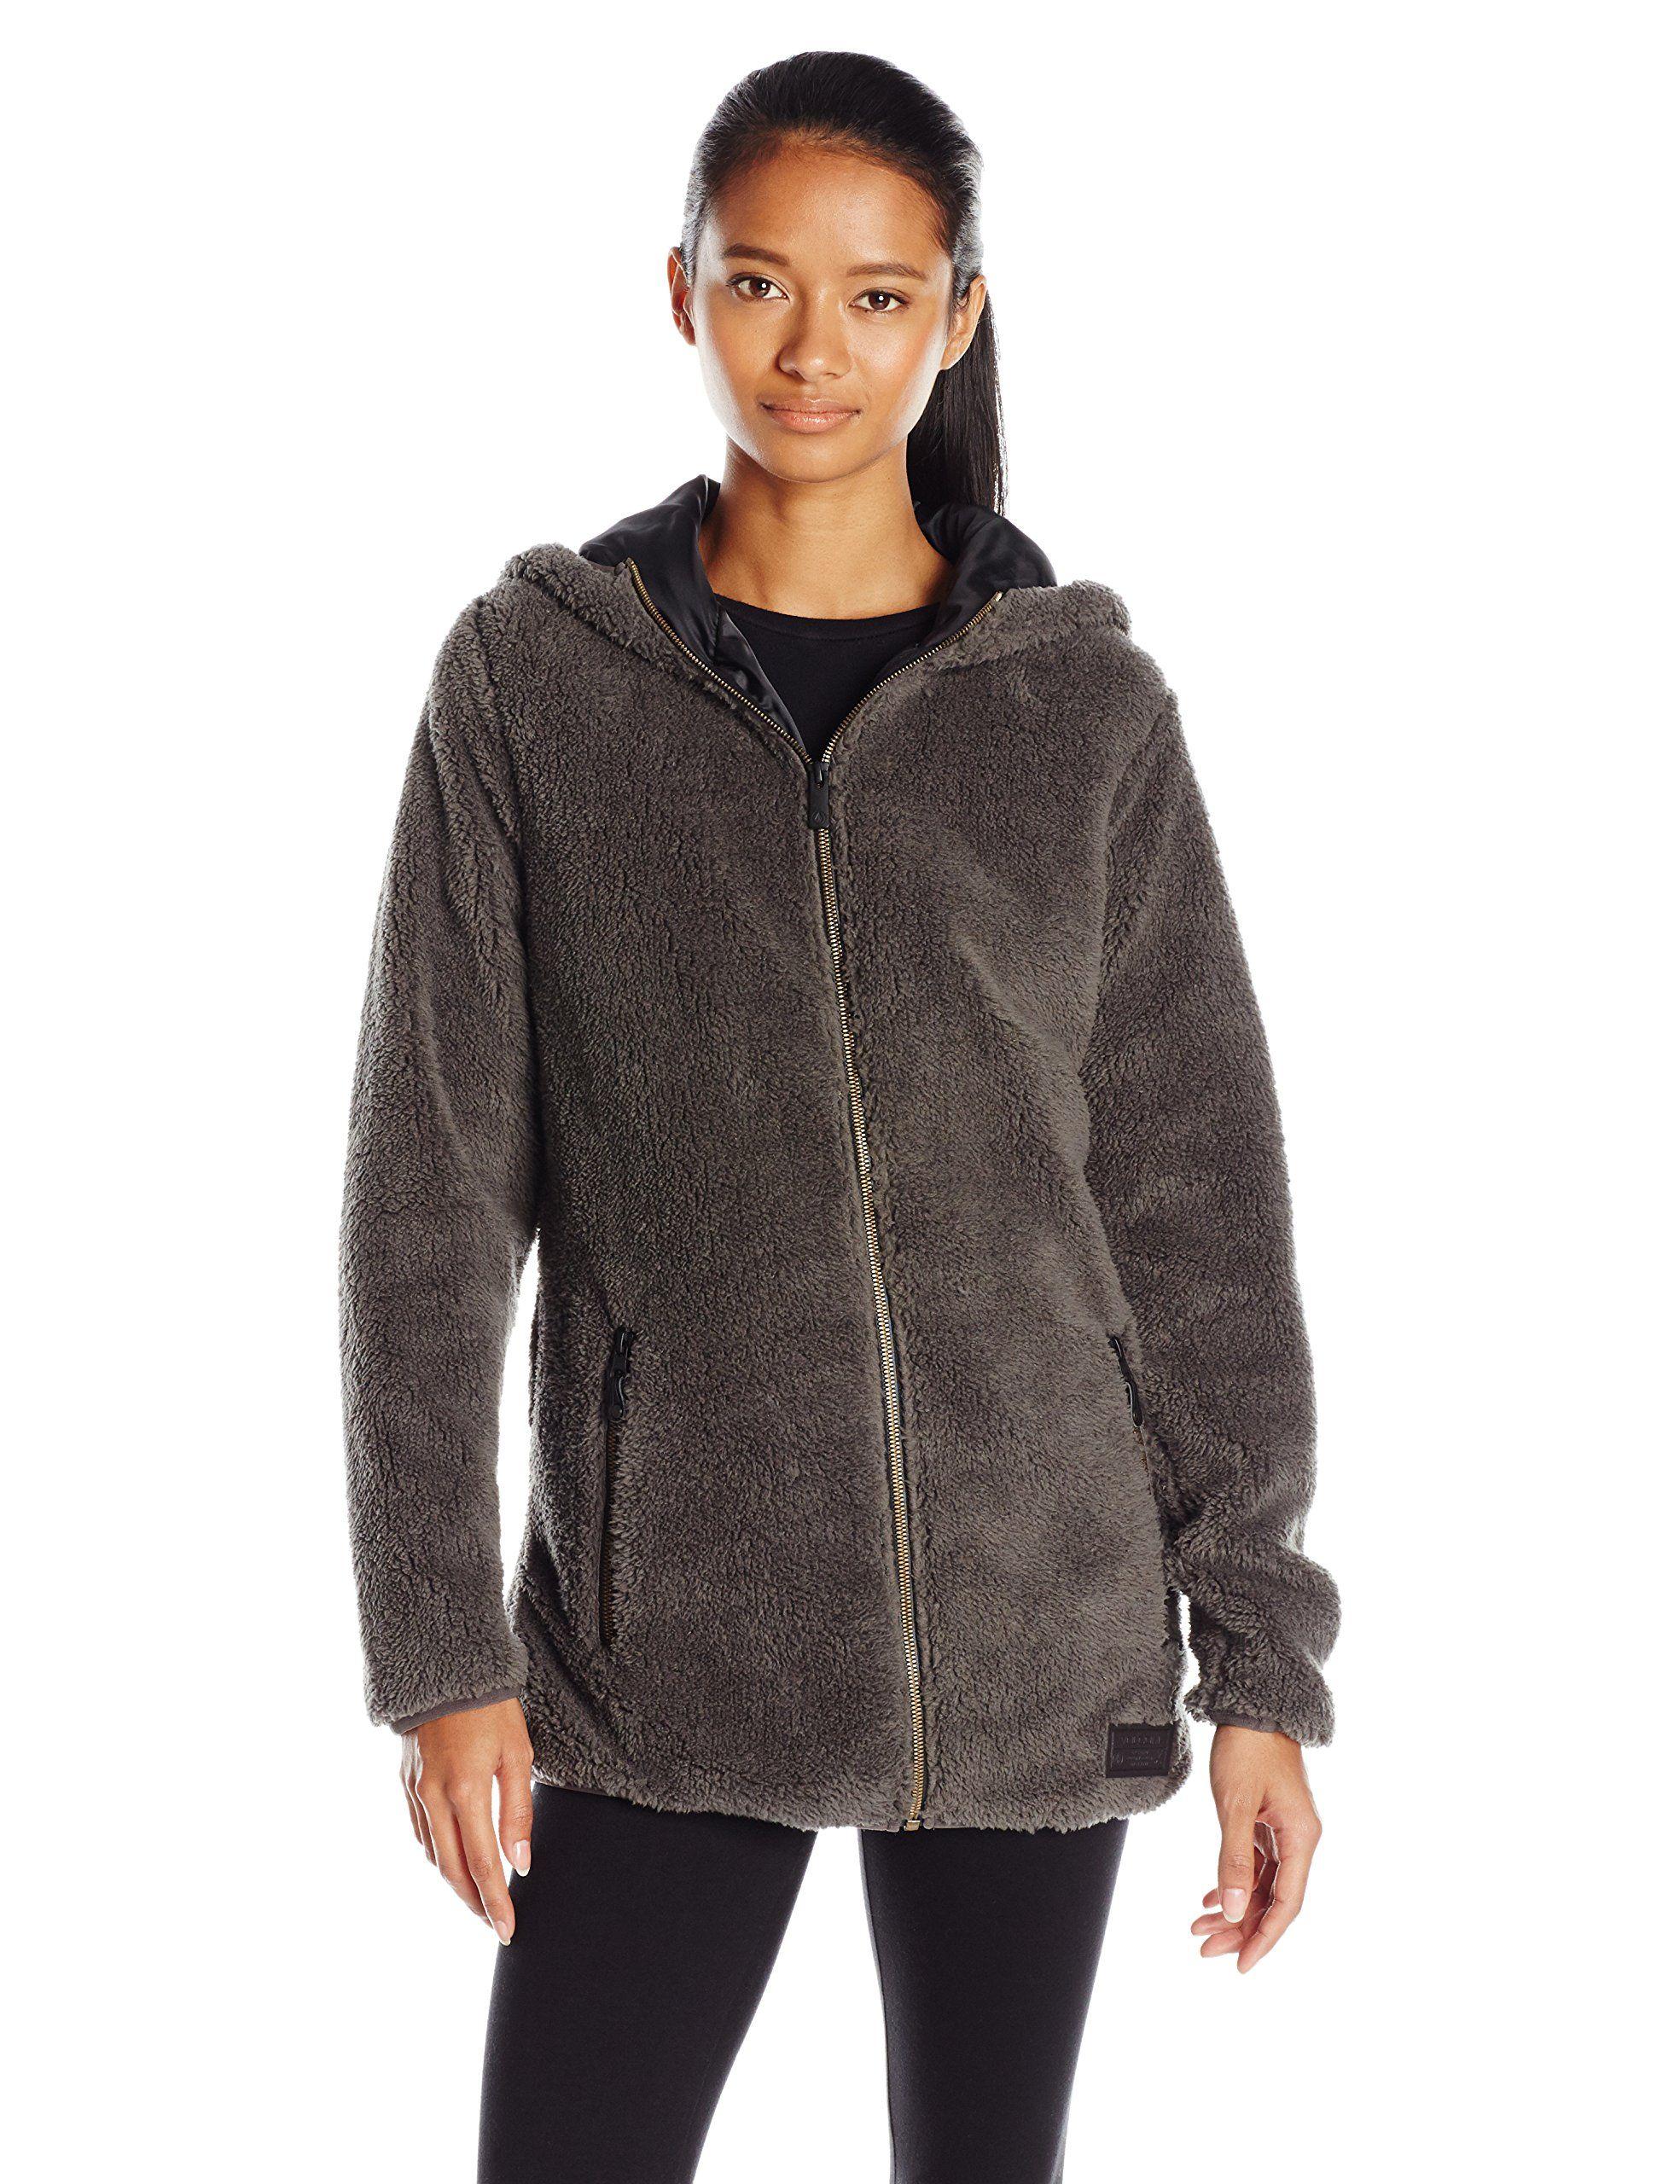 Volcom womenus butter sherpa snow jacket vintage black xsmall